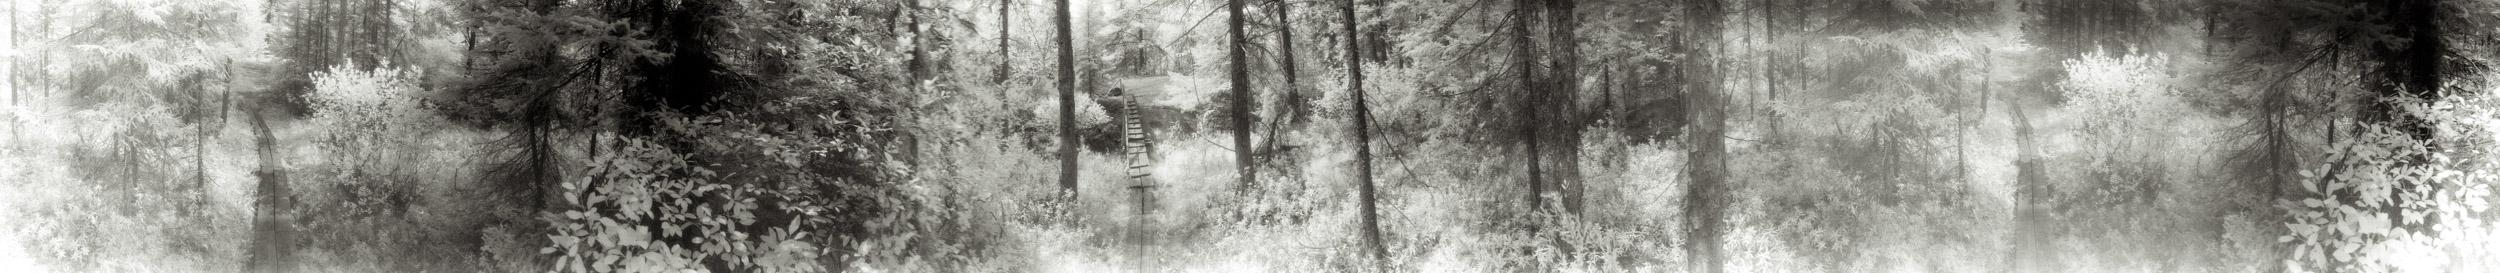 Plank trail